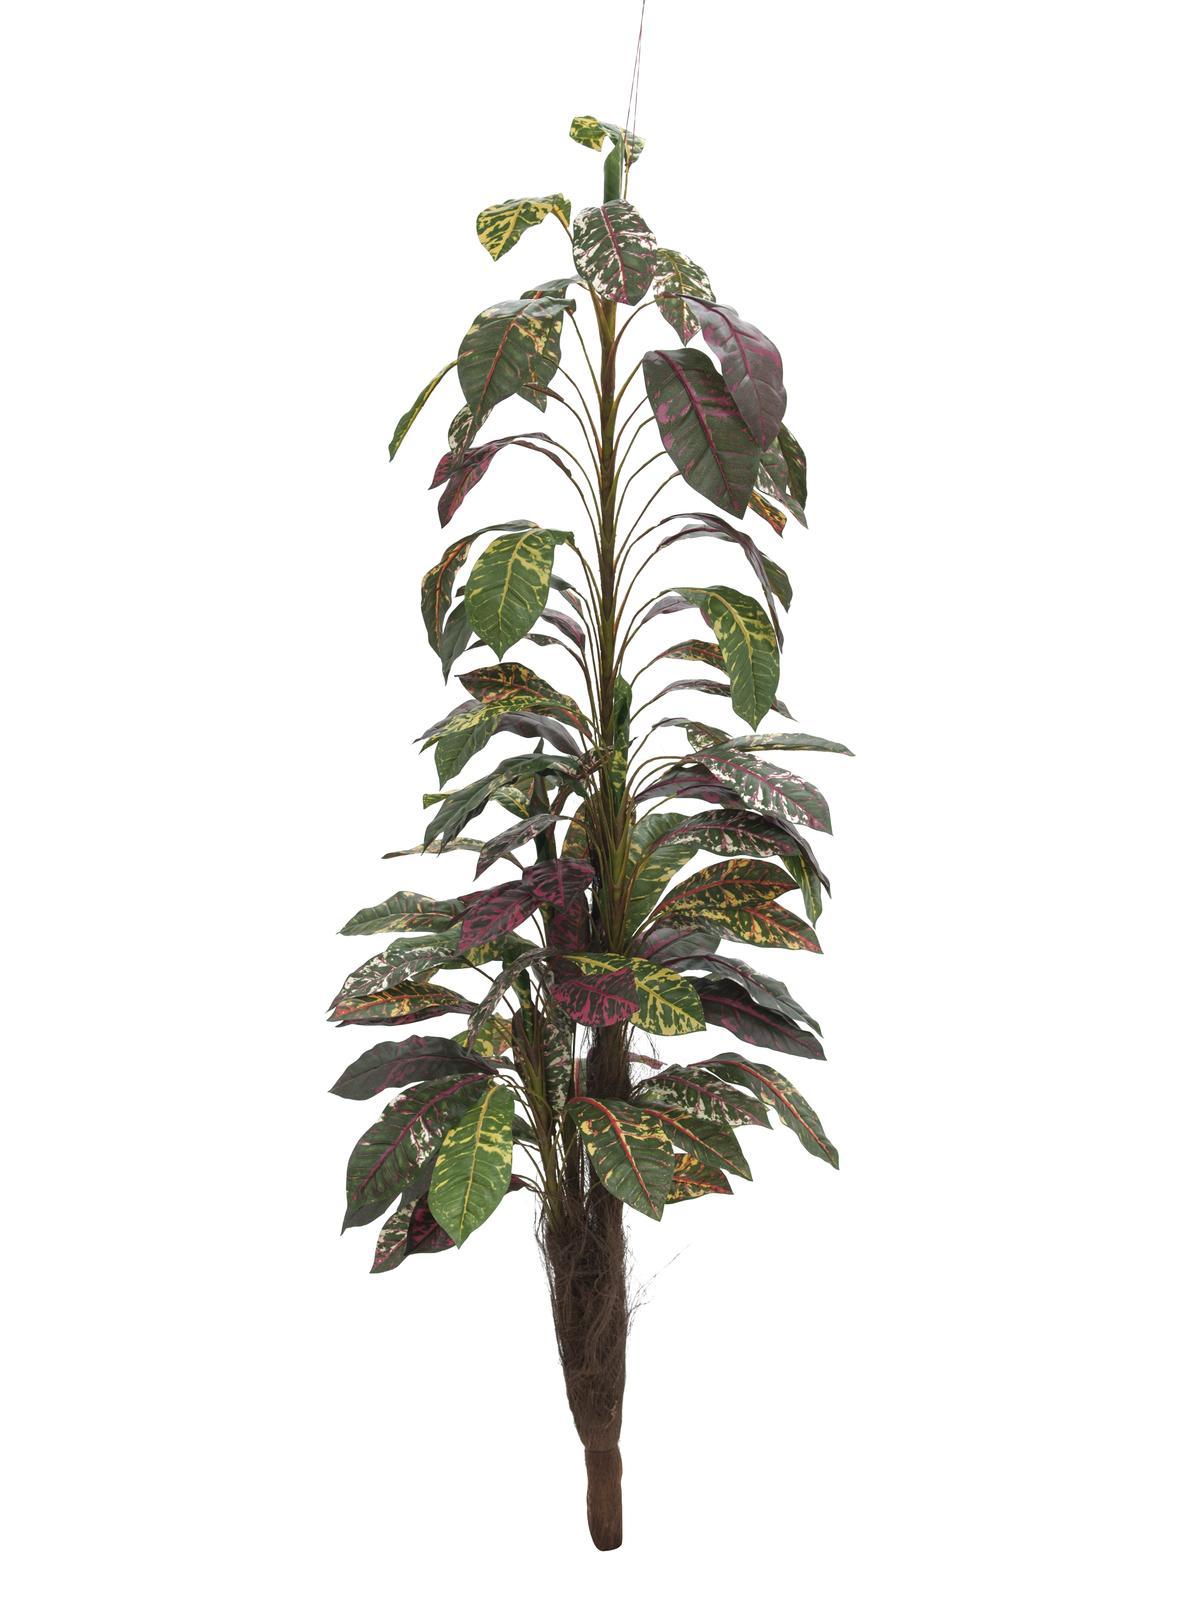 Croton mit Cocosstamm, 180 cm